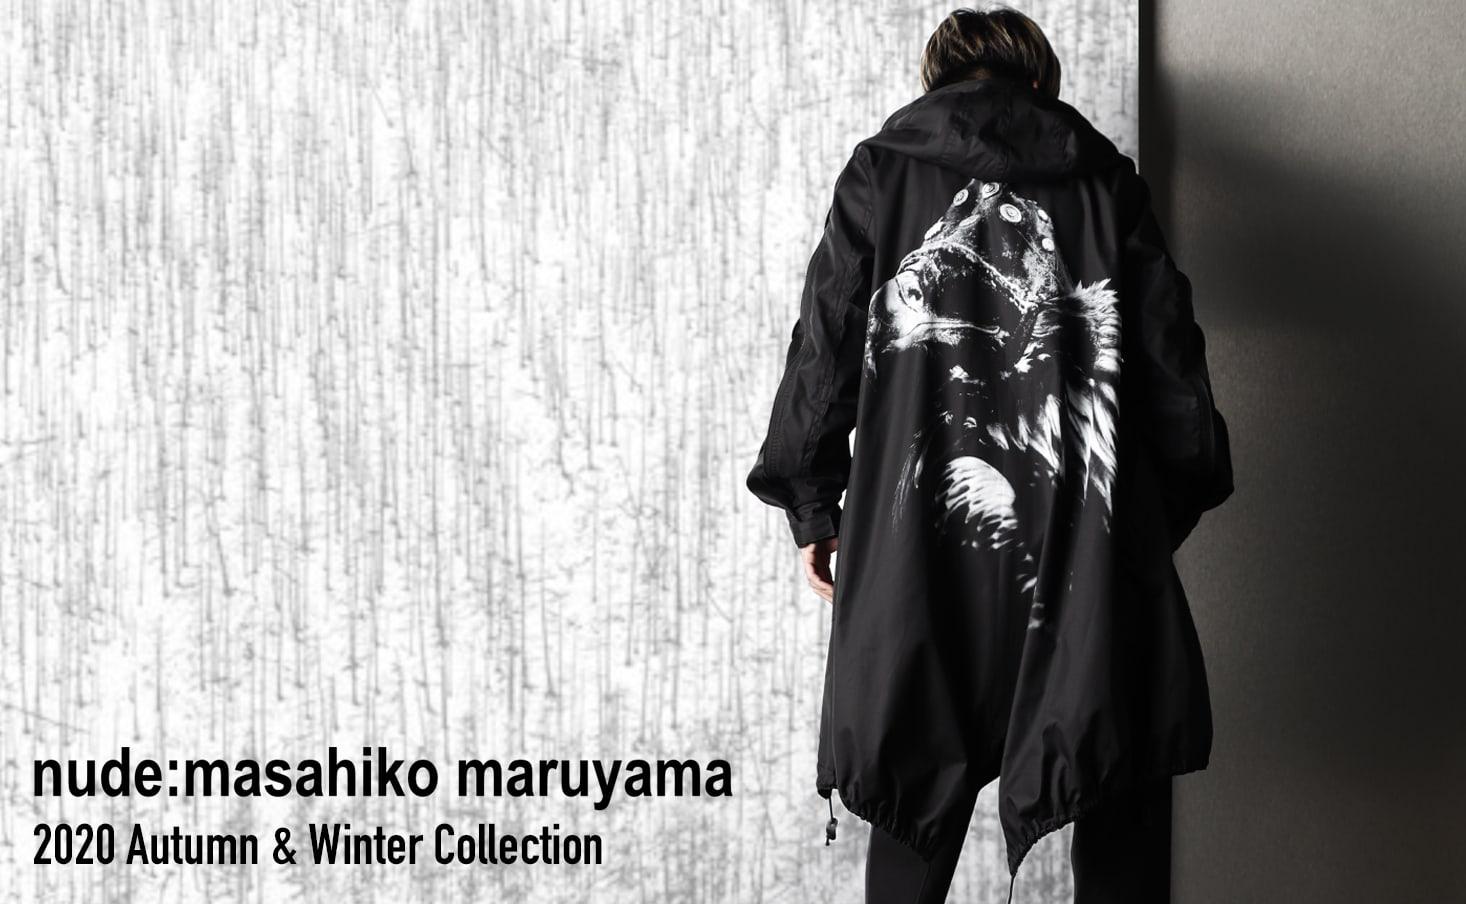 nude:masahiko maruyama 20AW